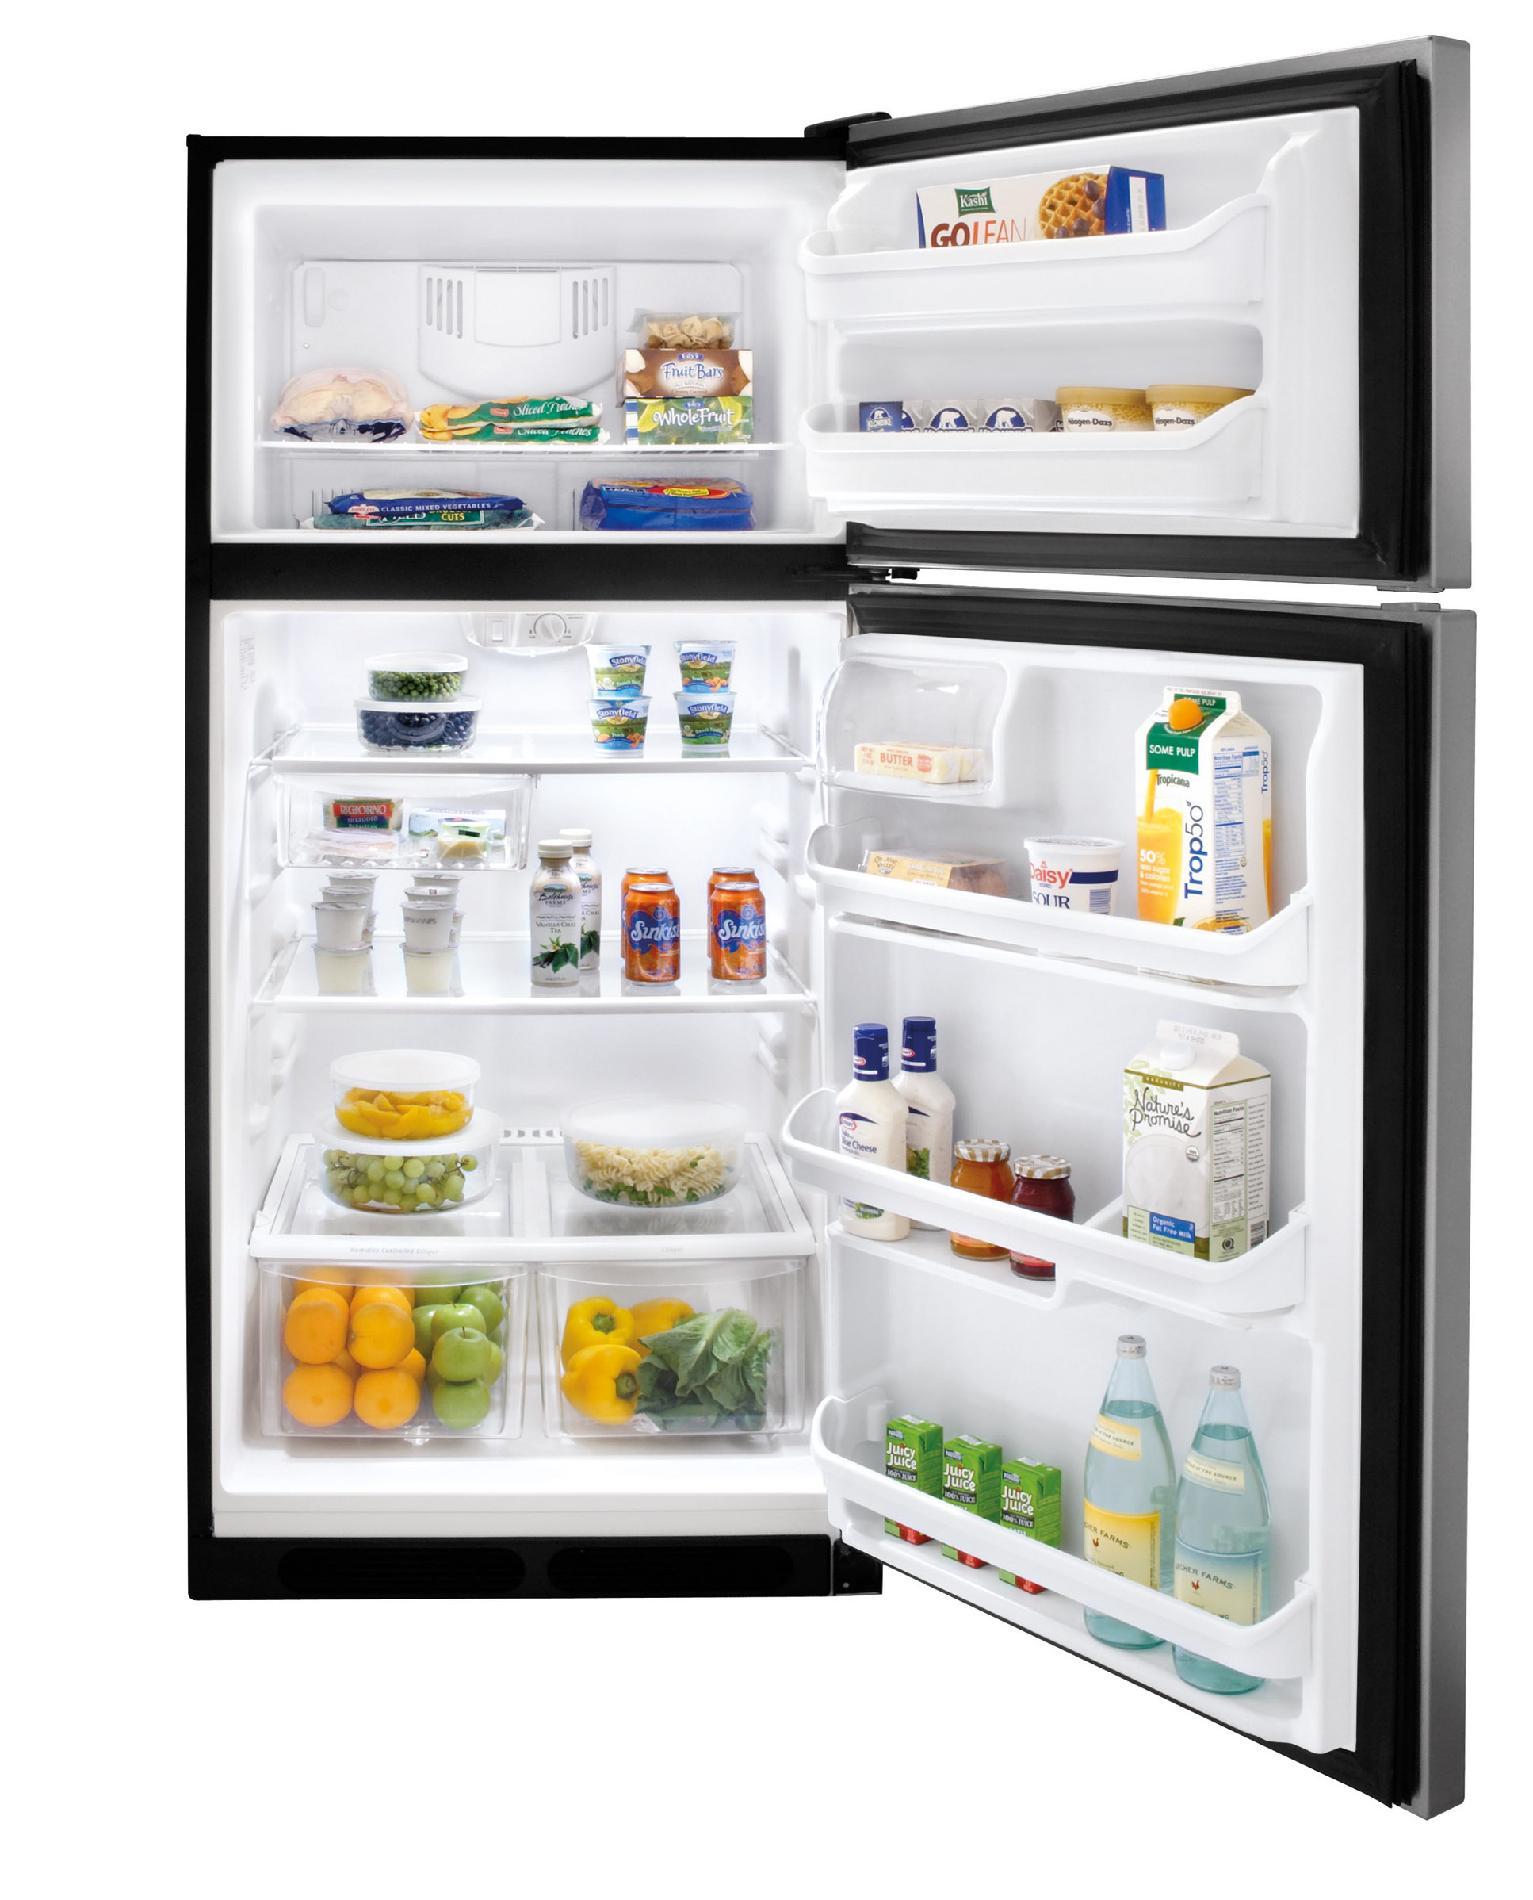 Frigidaire 18.3 cu. ft. Top-Freezer Refrigerator - Stainless Steel